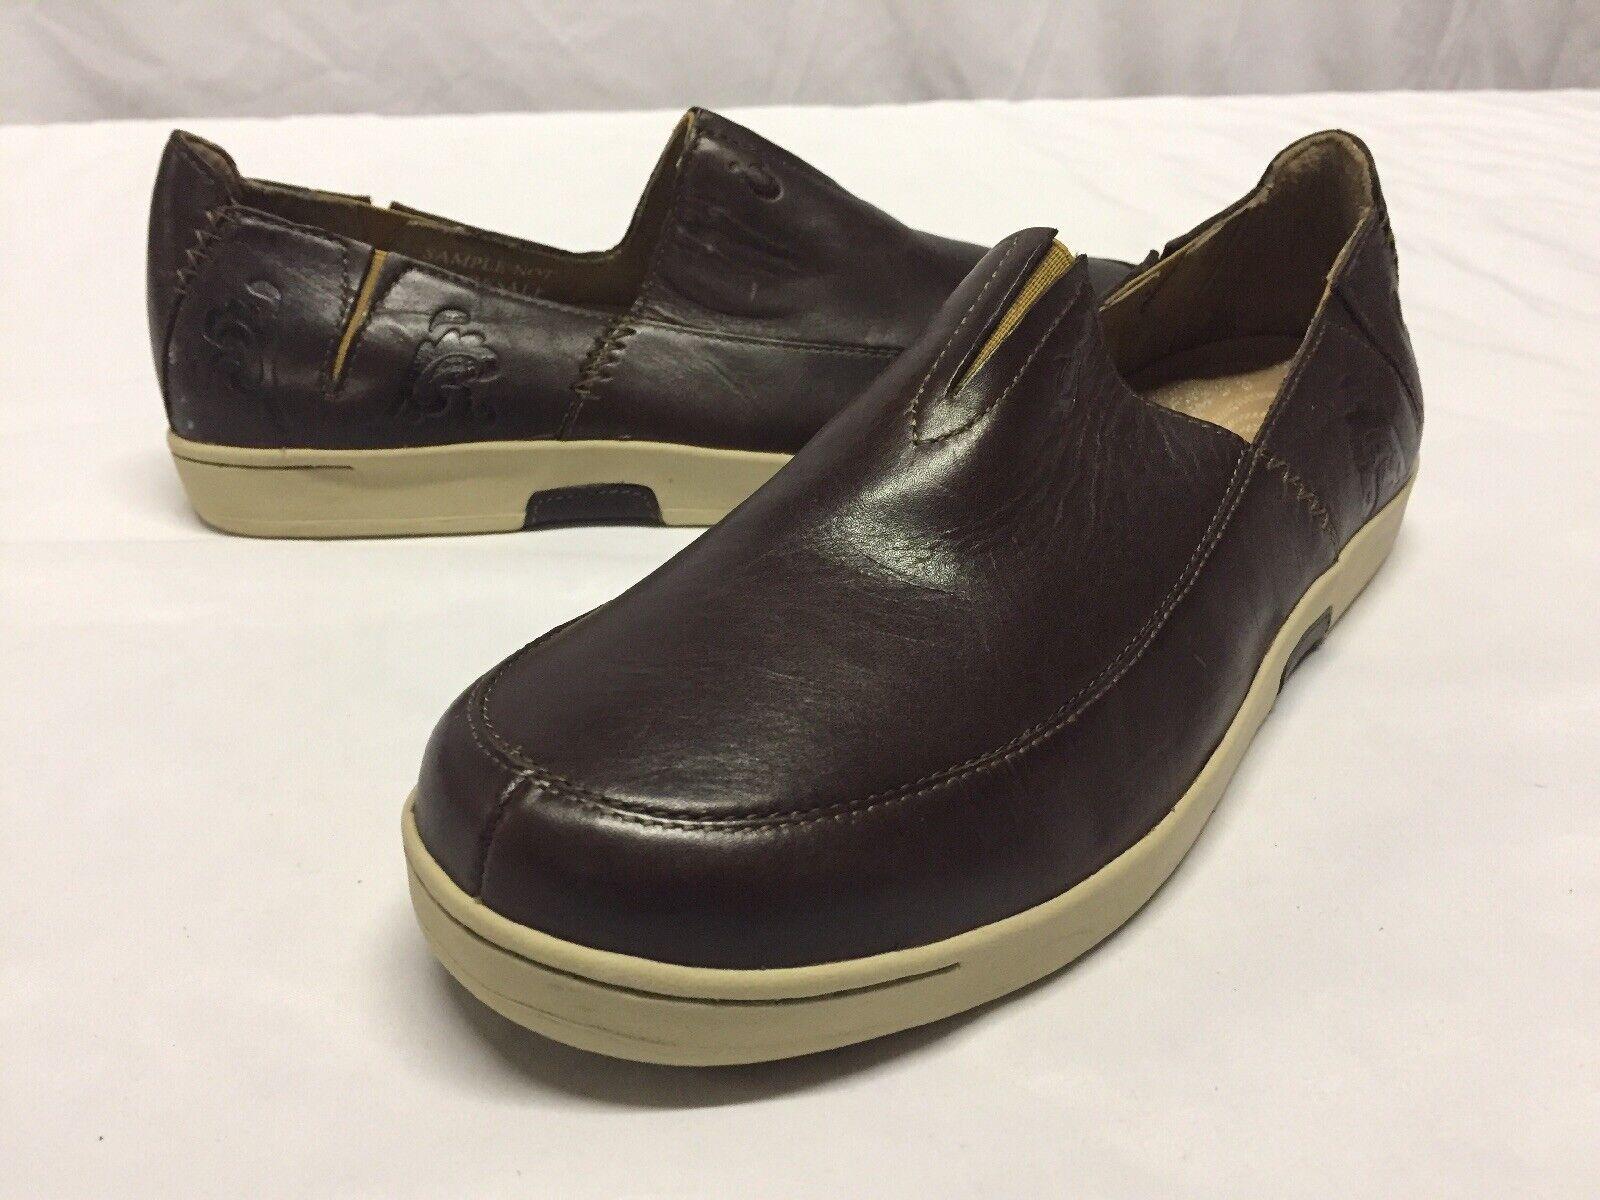 Olukai M's KAMA'AINA shoes Men's, Brown, Size US 8 M Eur 40